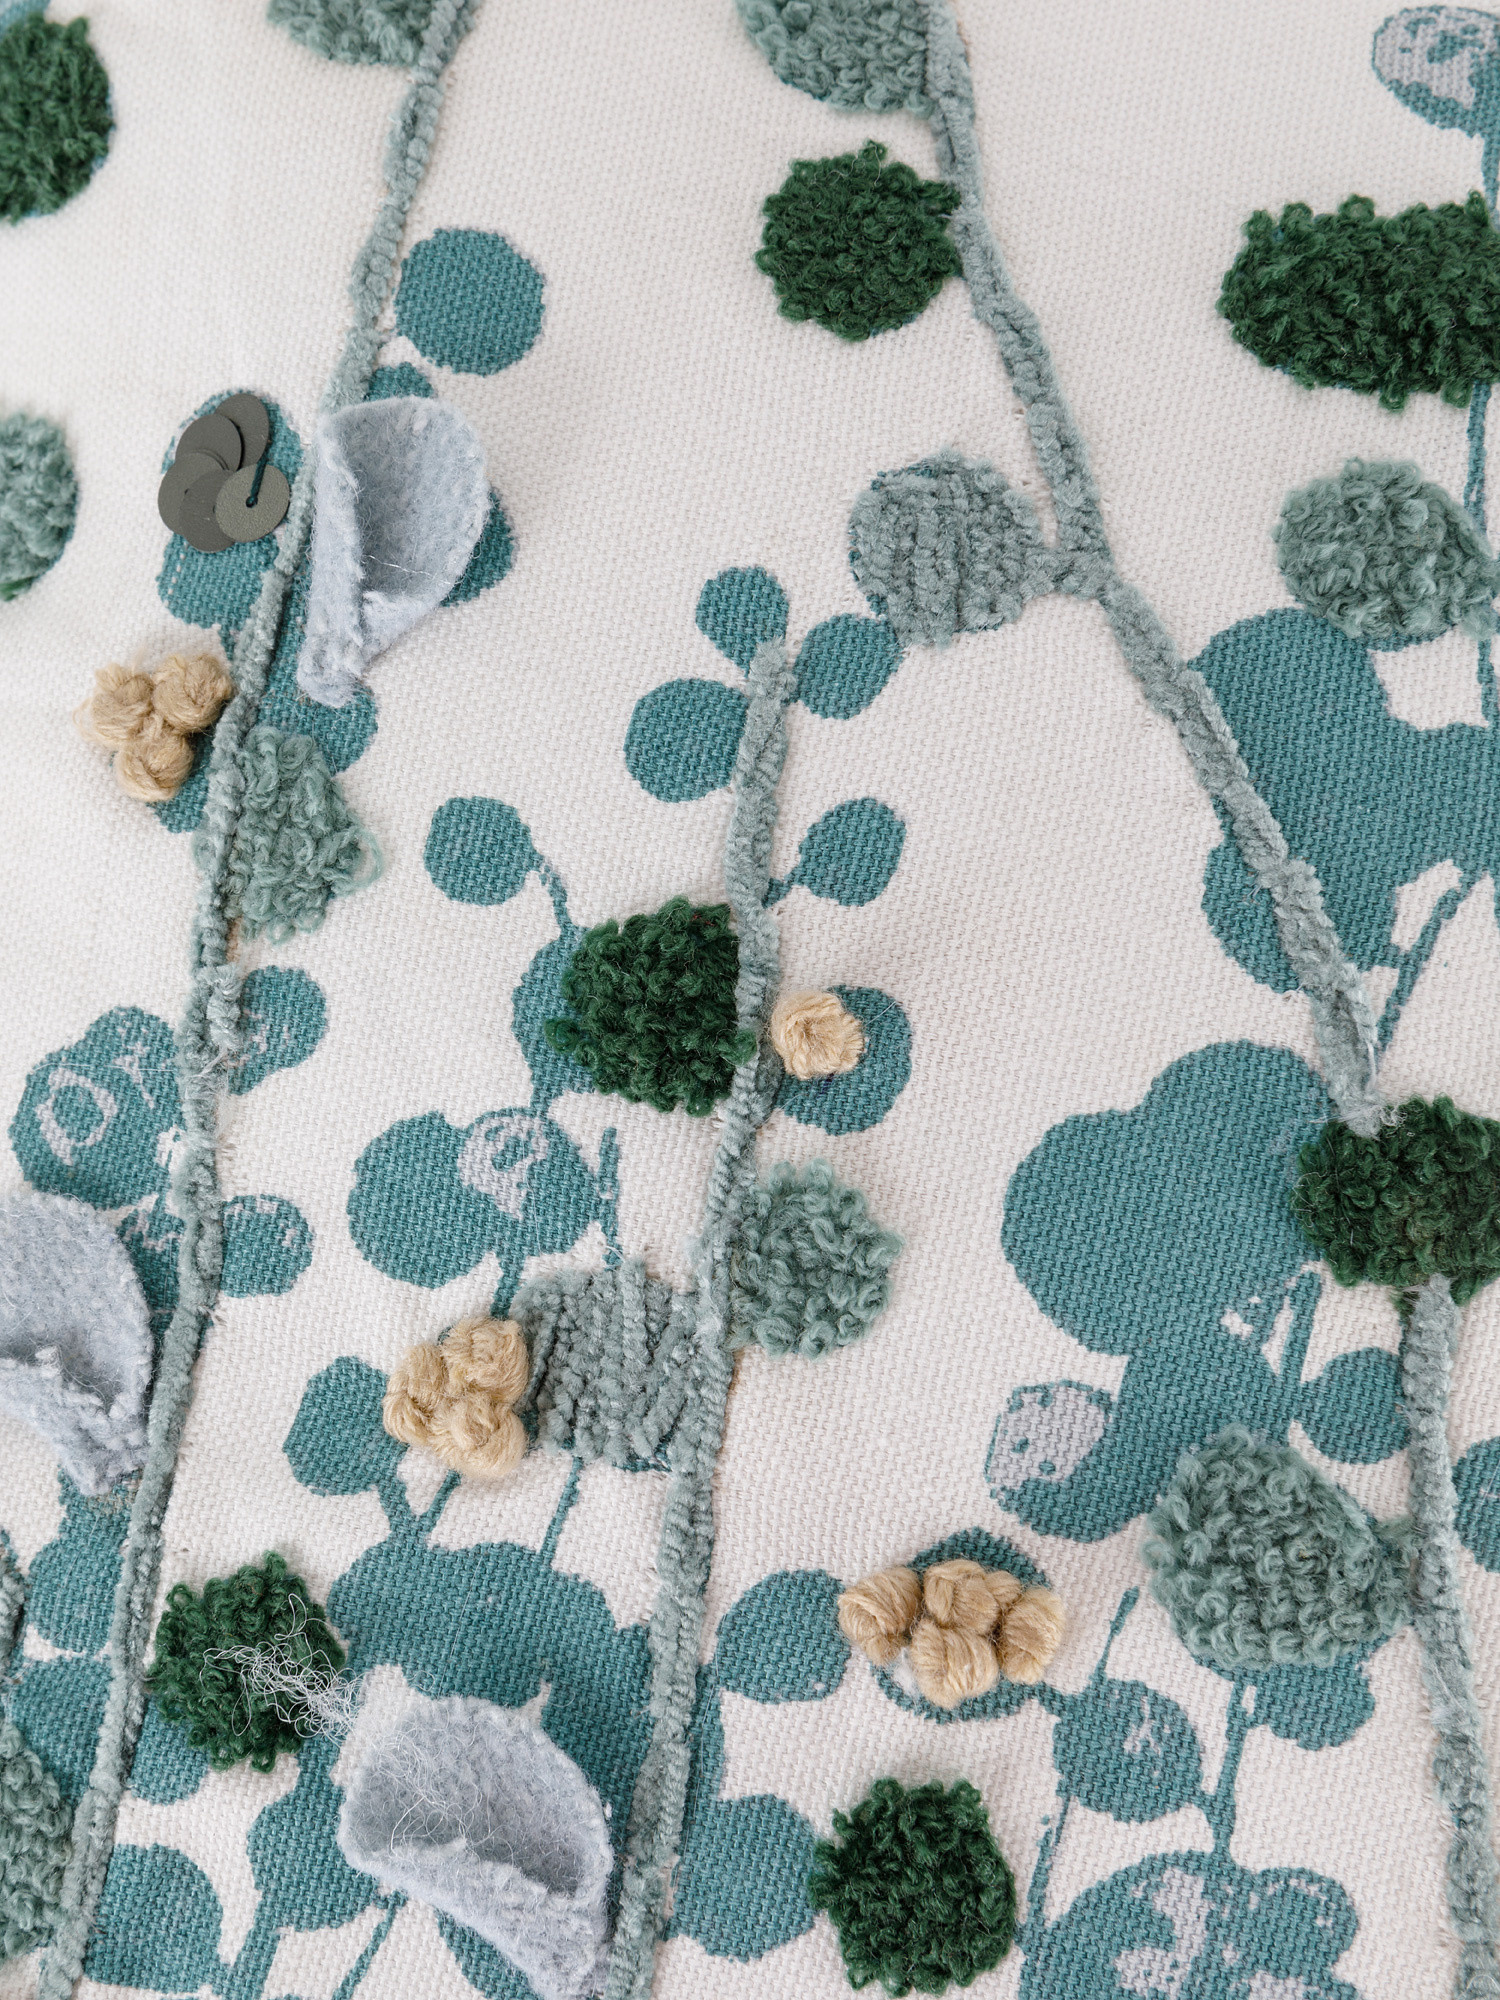 Cuscino cotone ricamo eucalipto 45x45cm, Multicolor, large image number 2